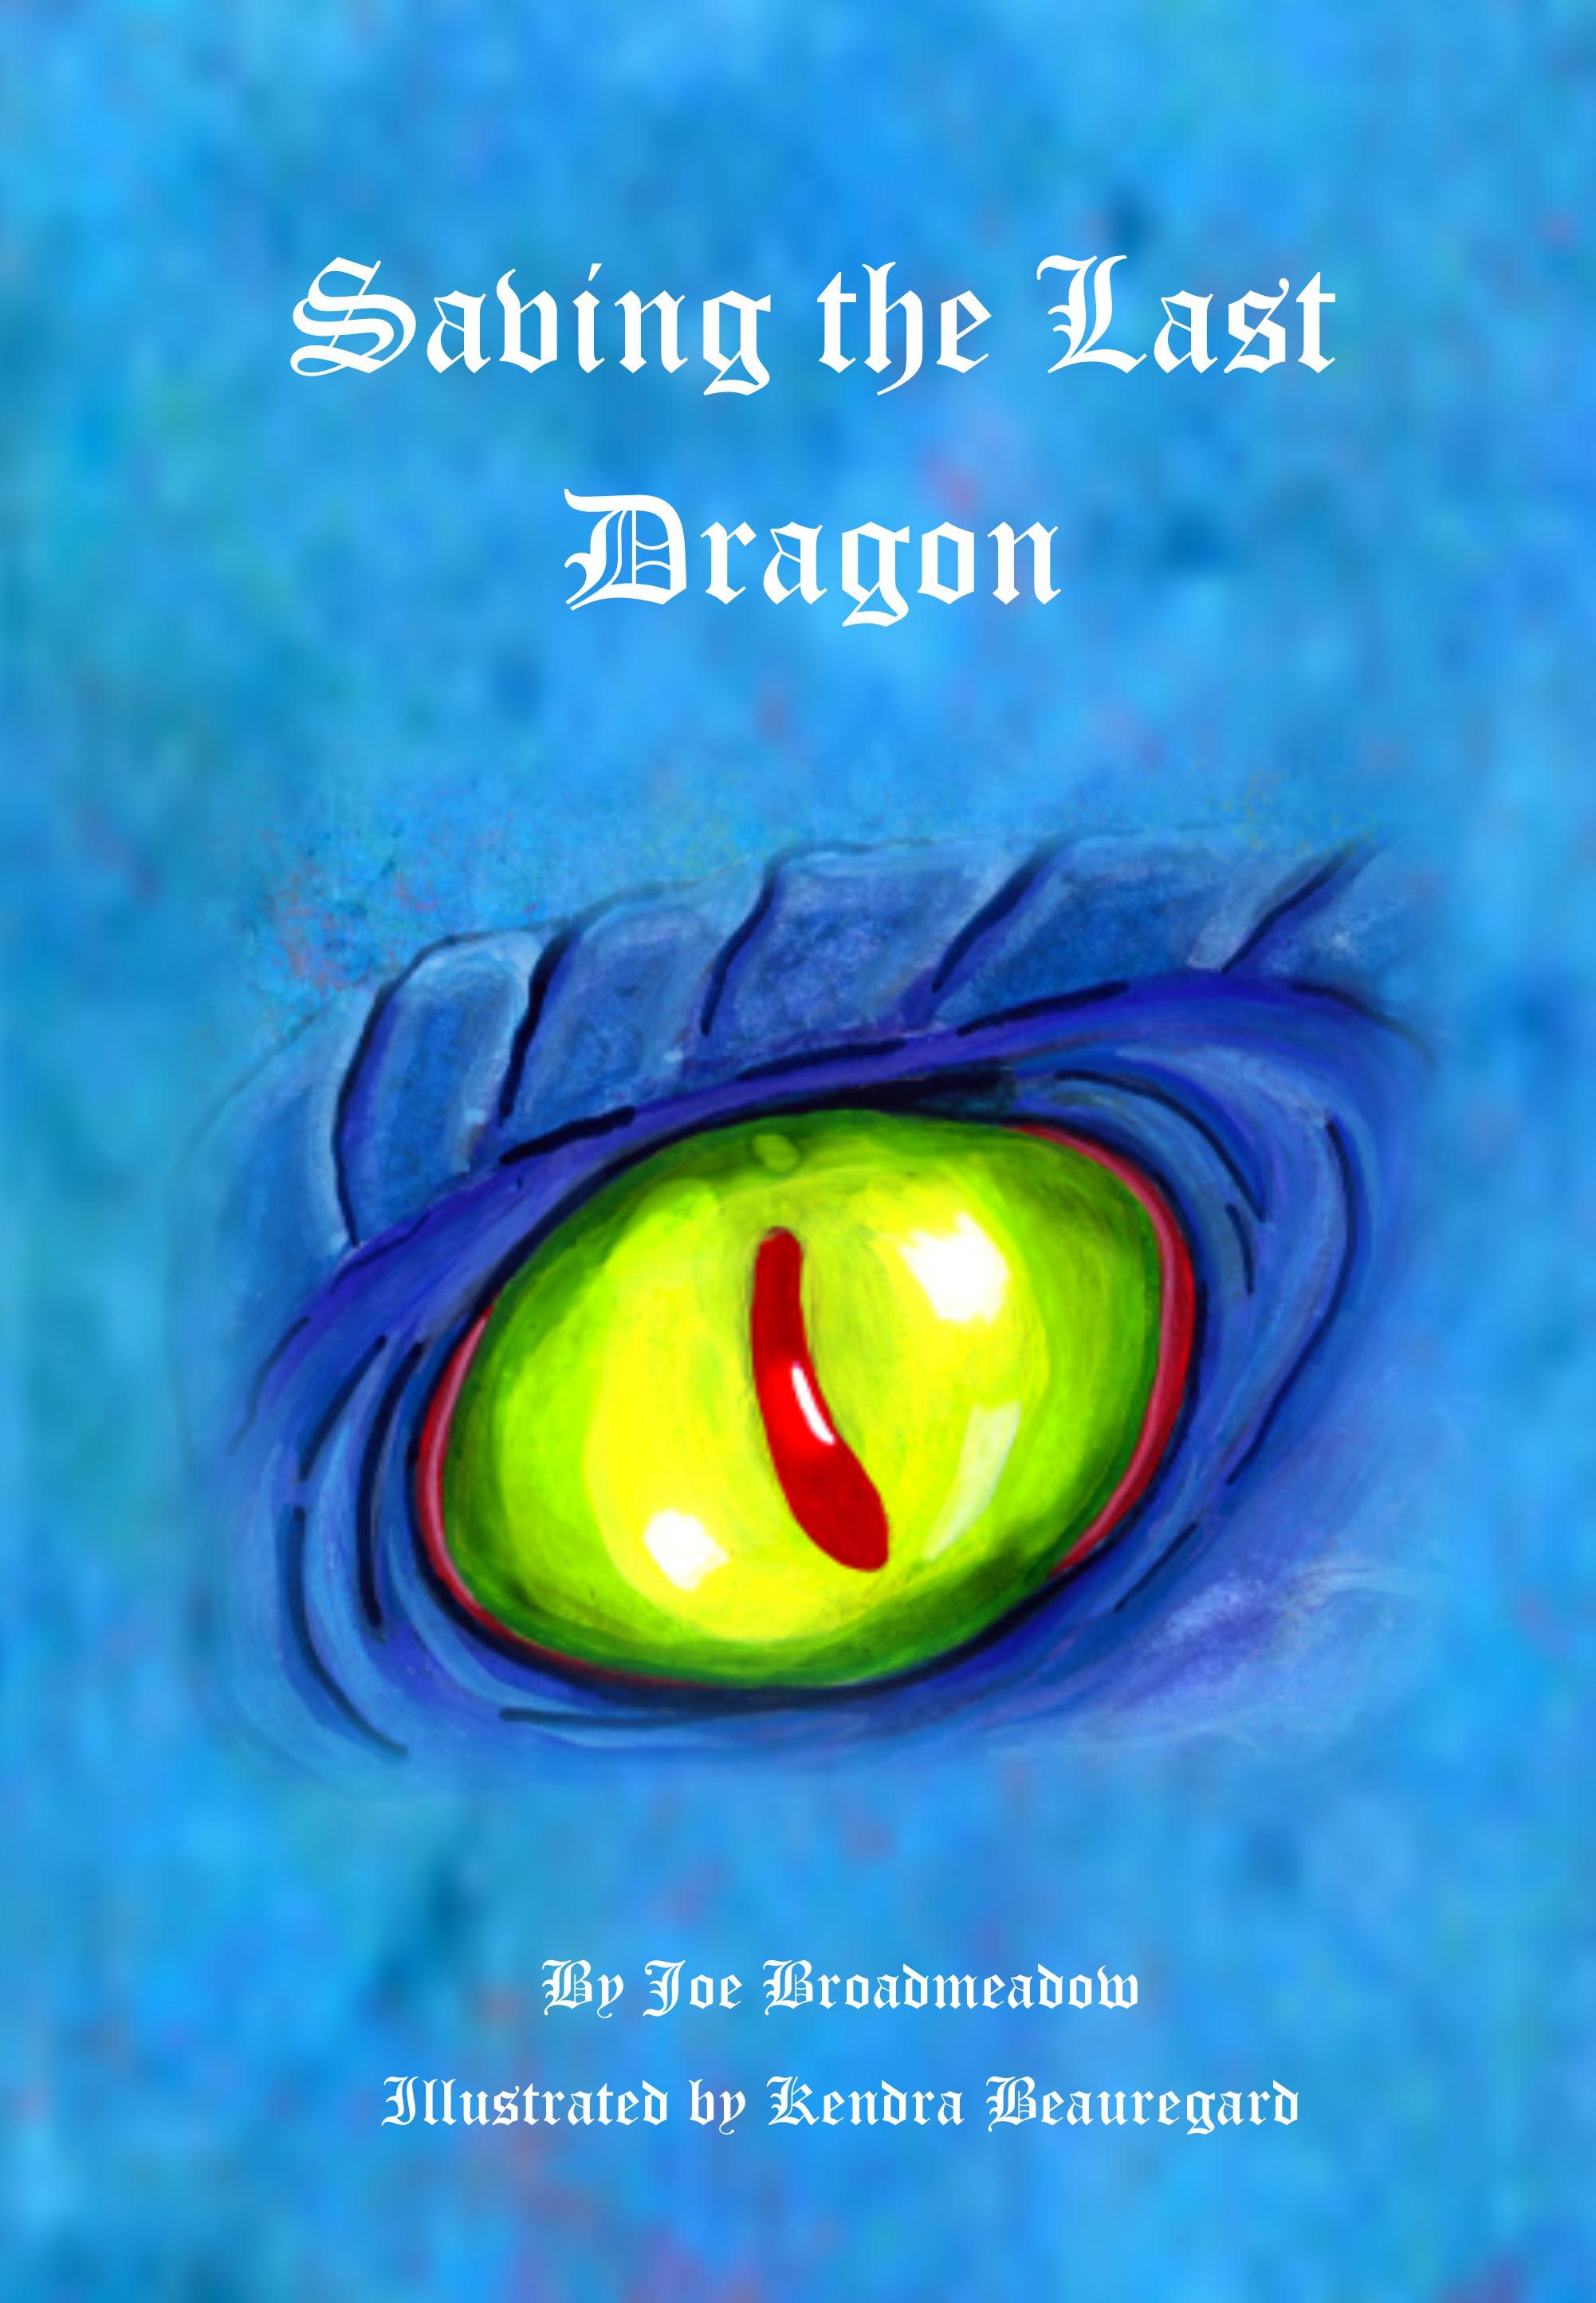 Saving the Last Dragon